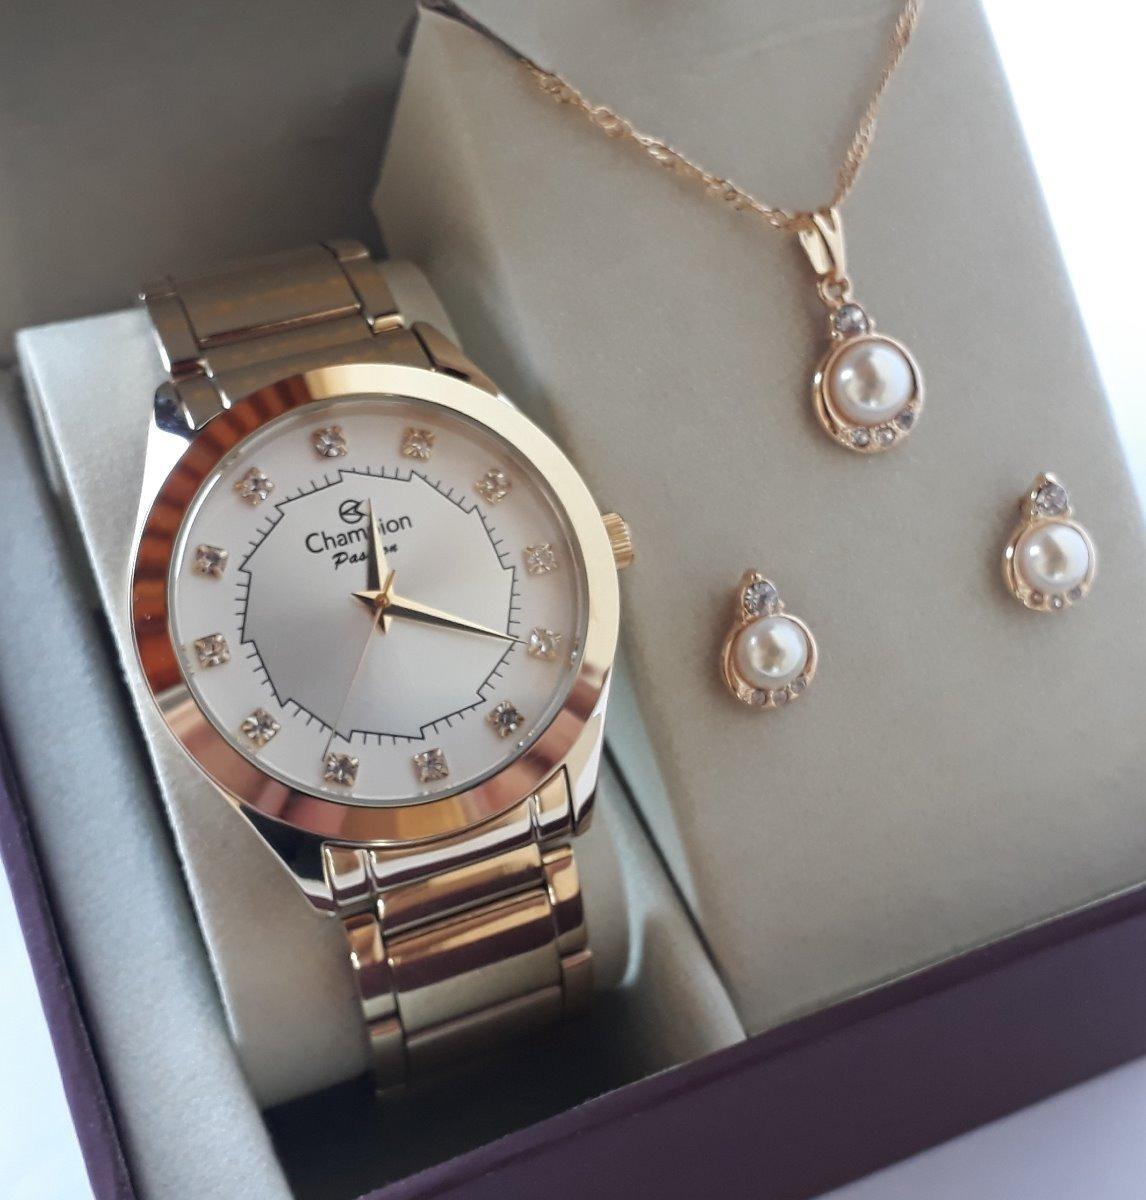 92f0cfeb2be relógio champion feminino dourado kit colar brincos ch24759w. Carregando  zoom.